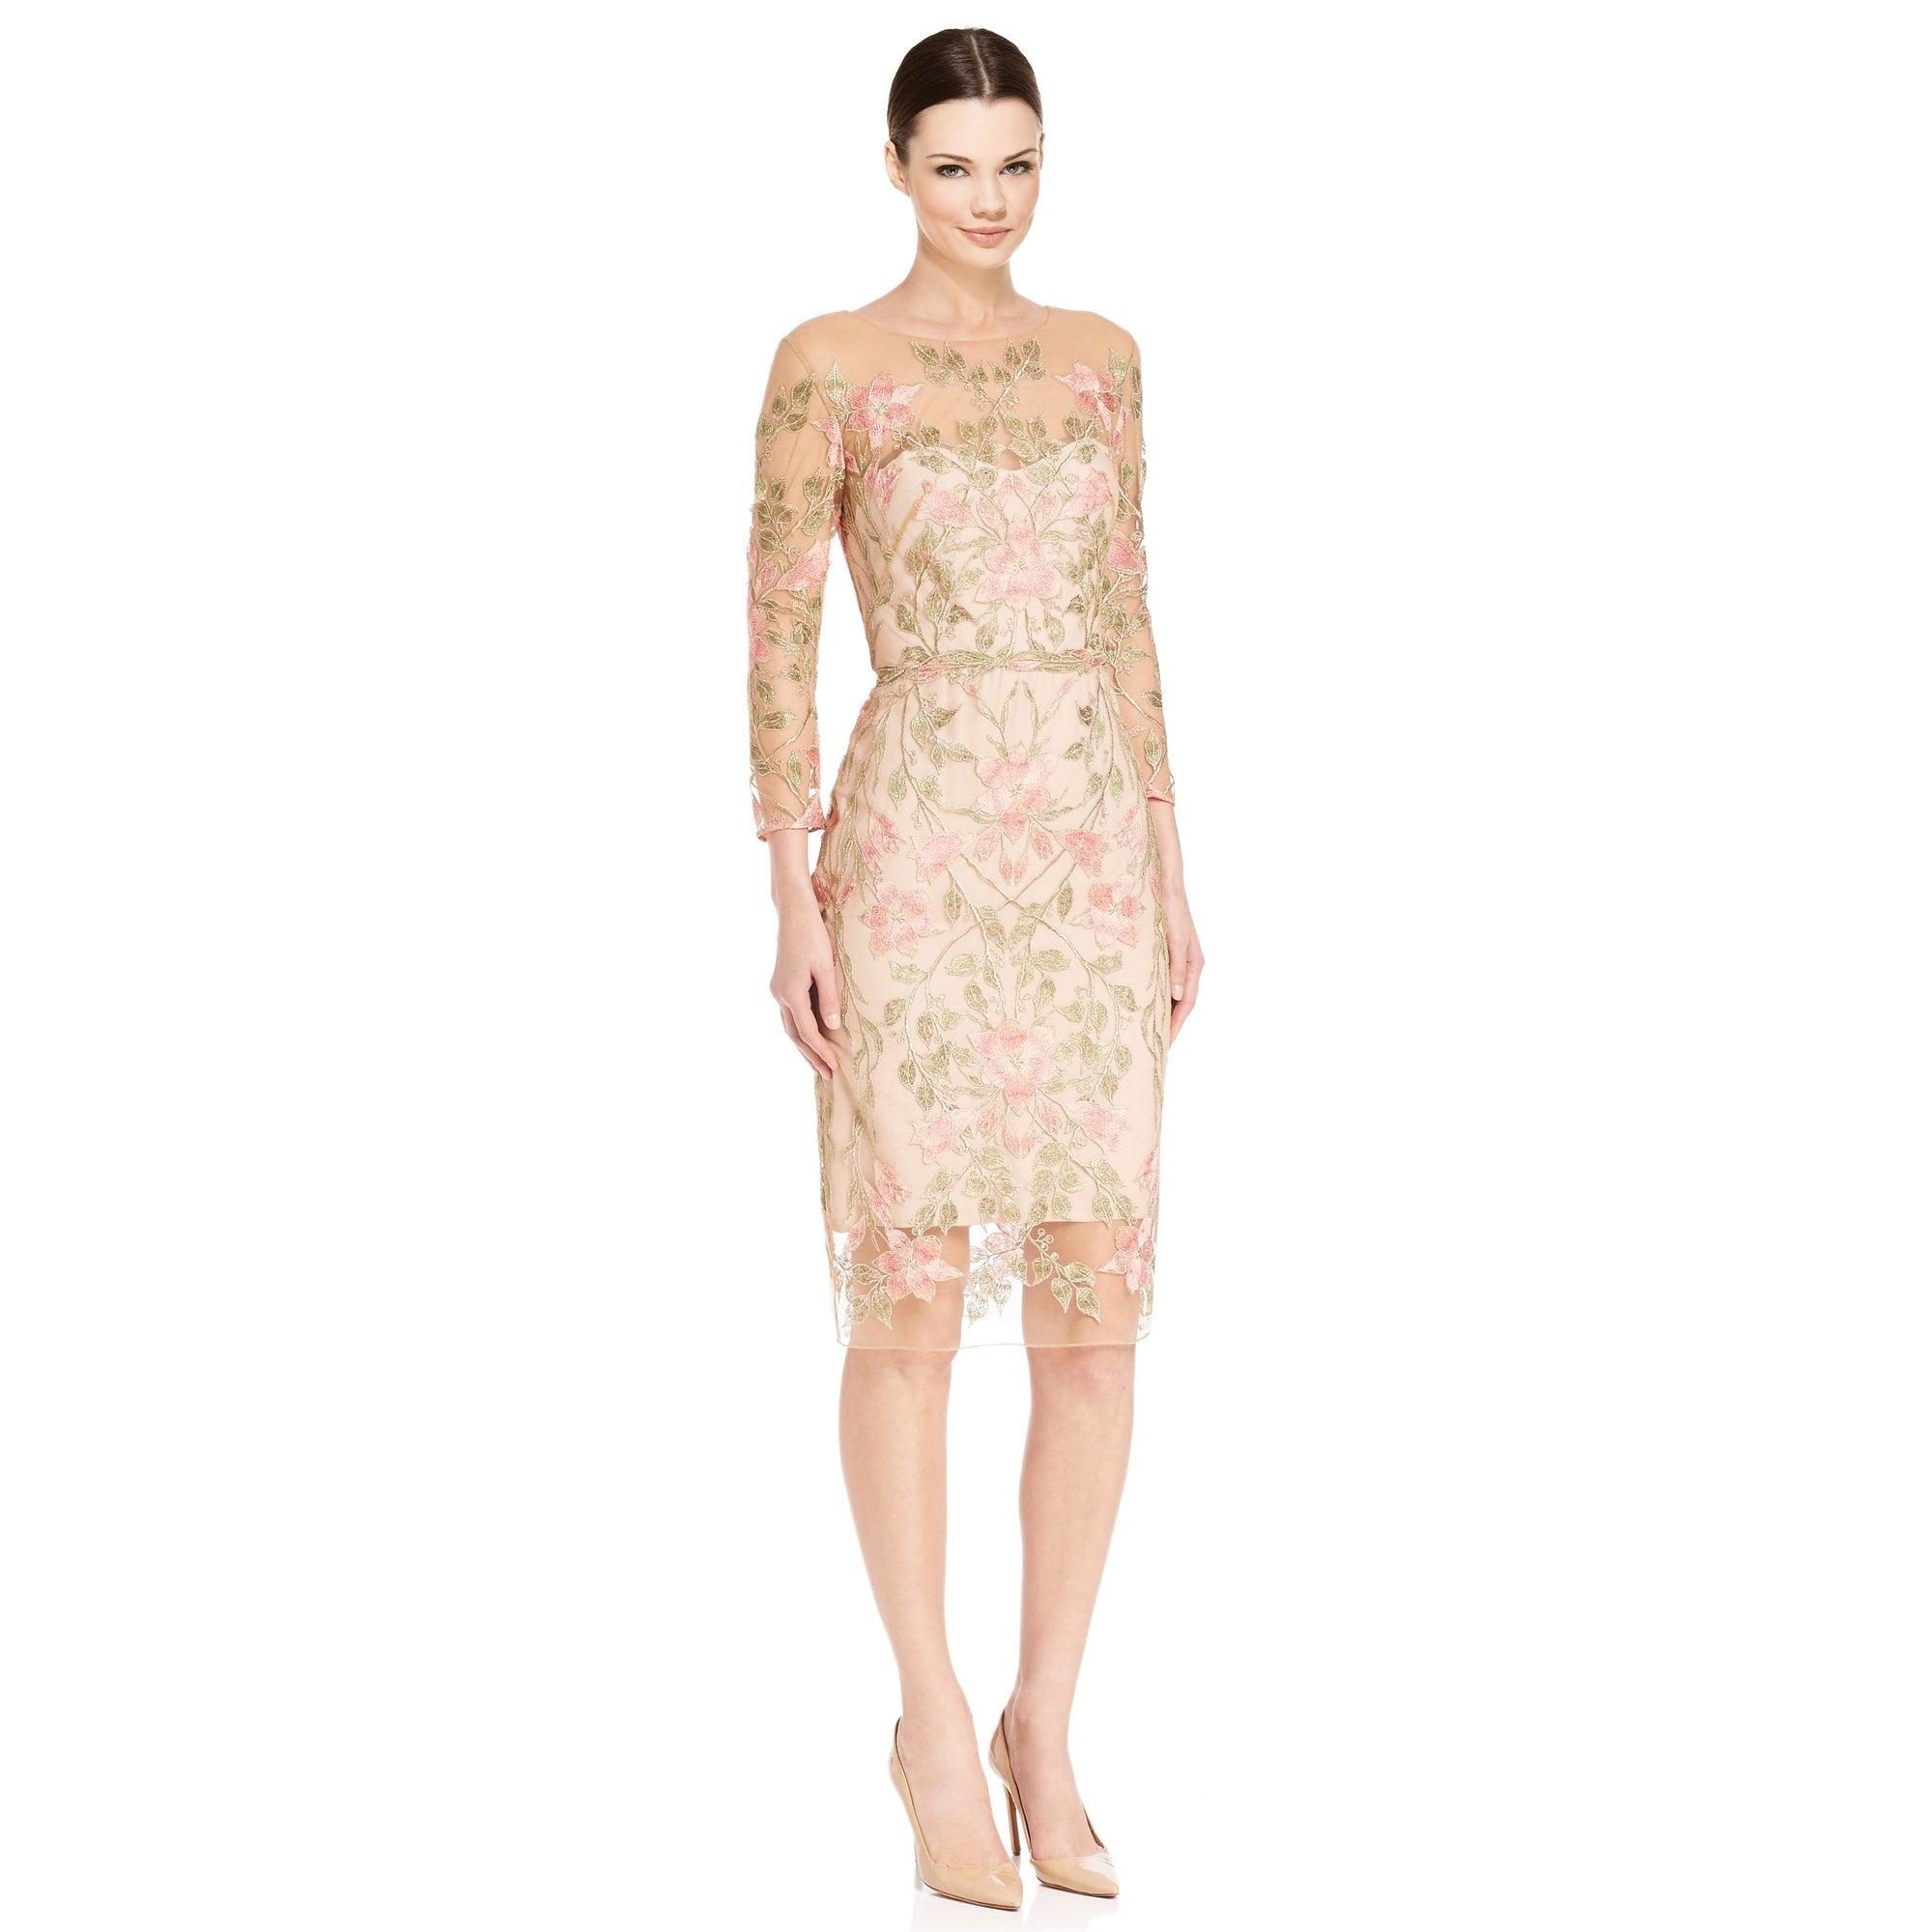 1da83dc9b6 Marchesa Notte Floral Embroidered 3/4 Sleeve Cocktail Evening Dress - 6